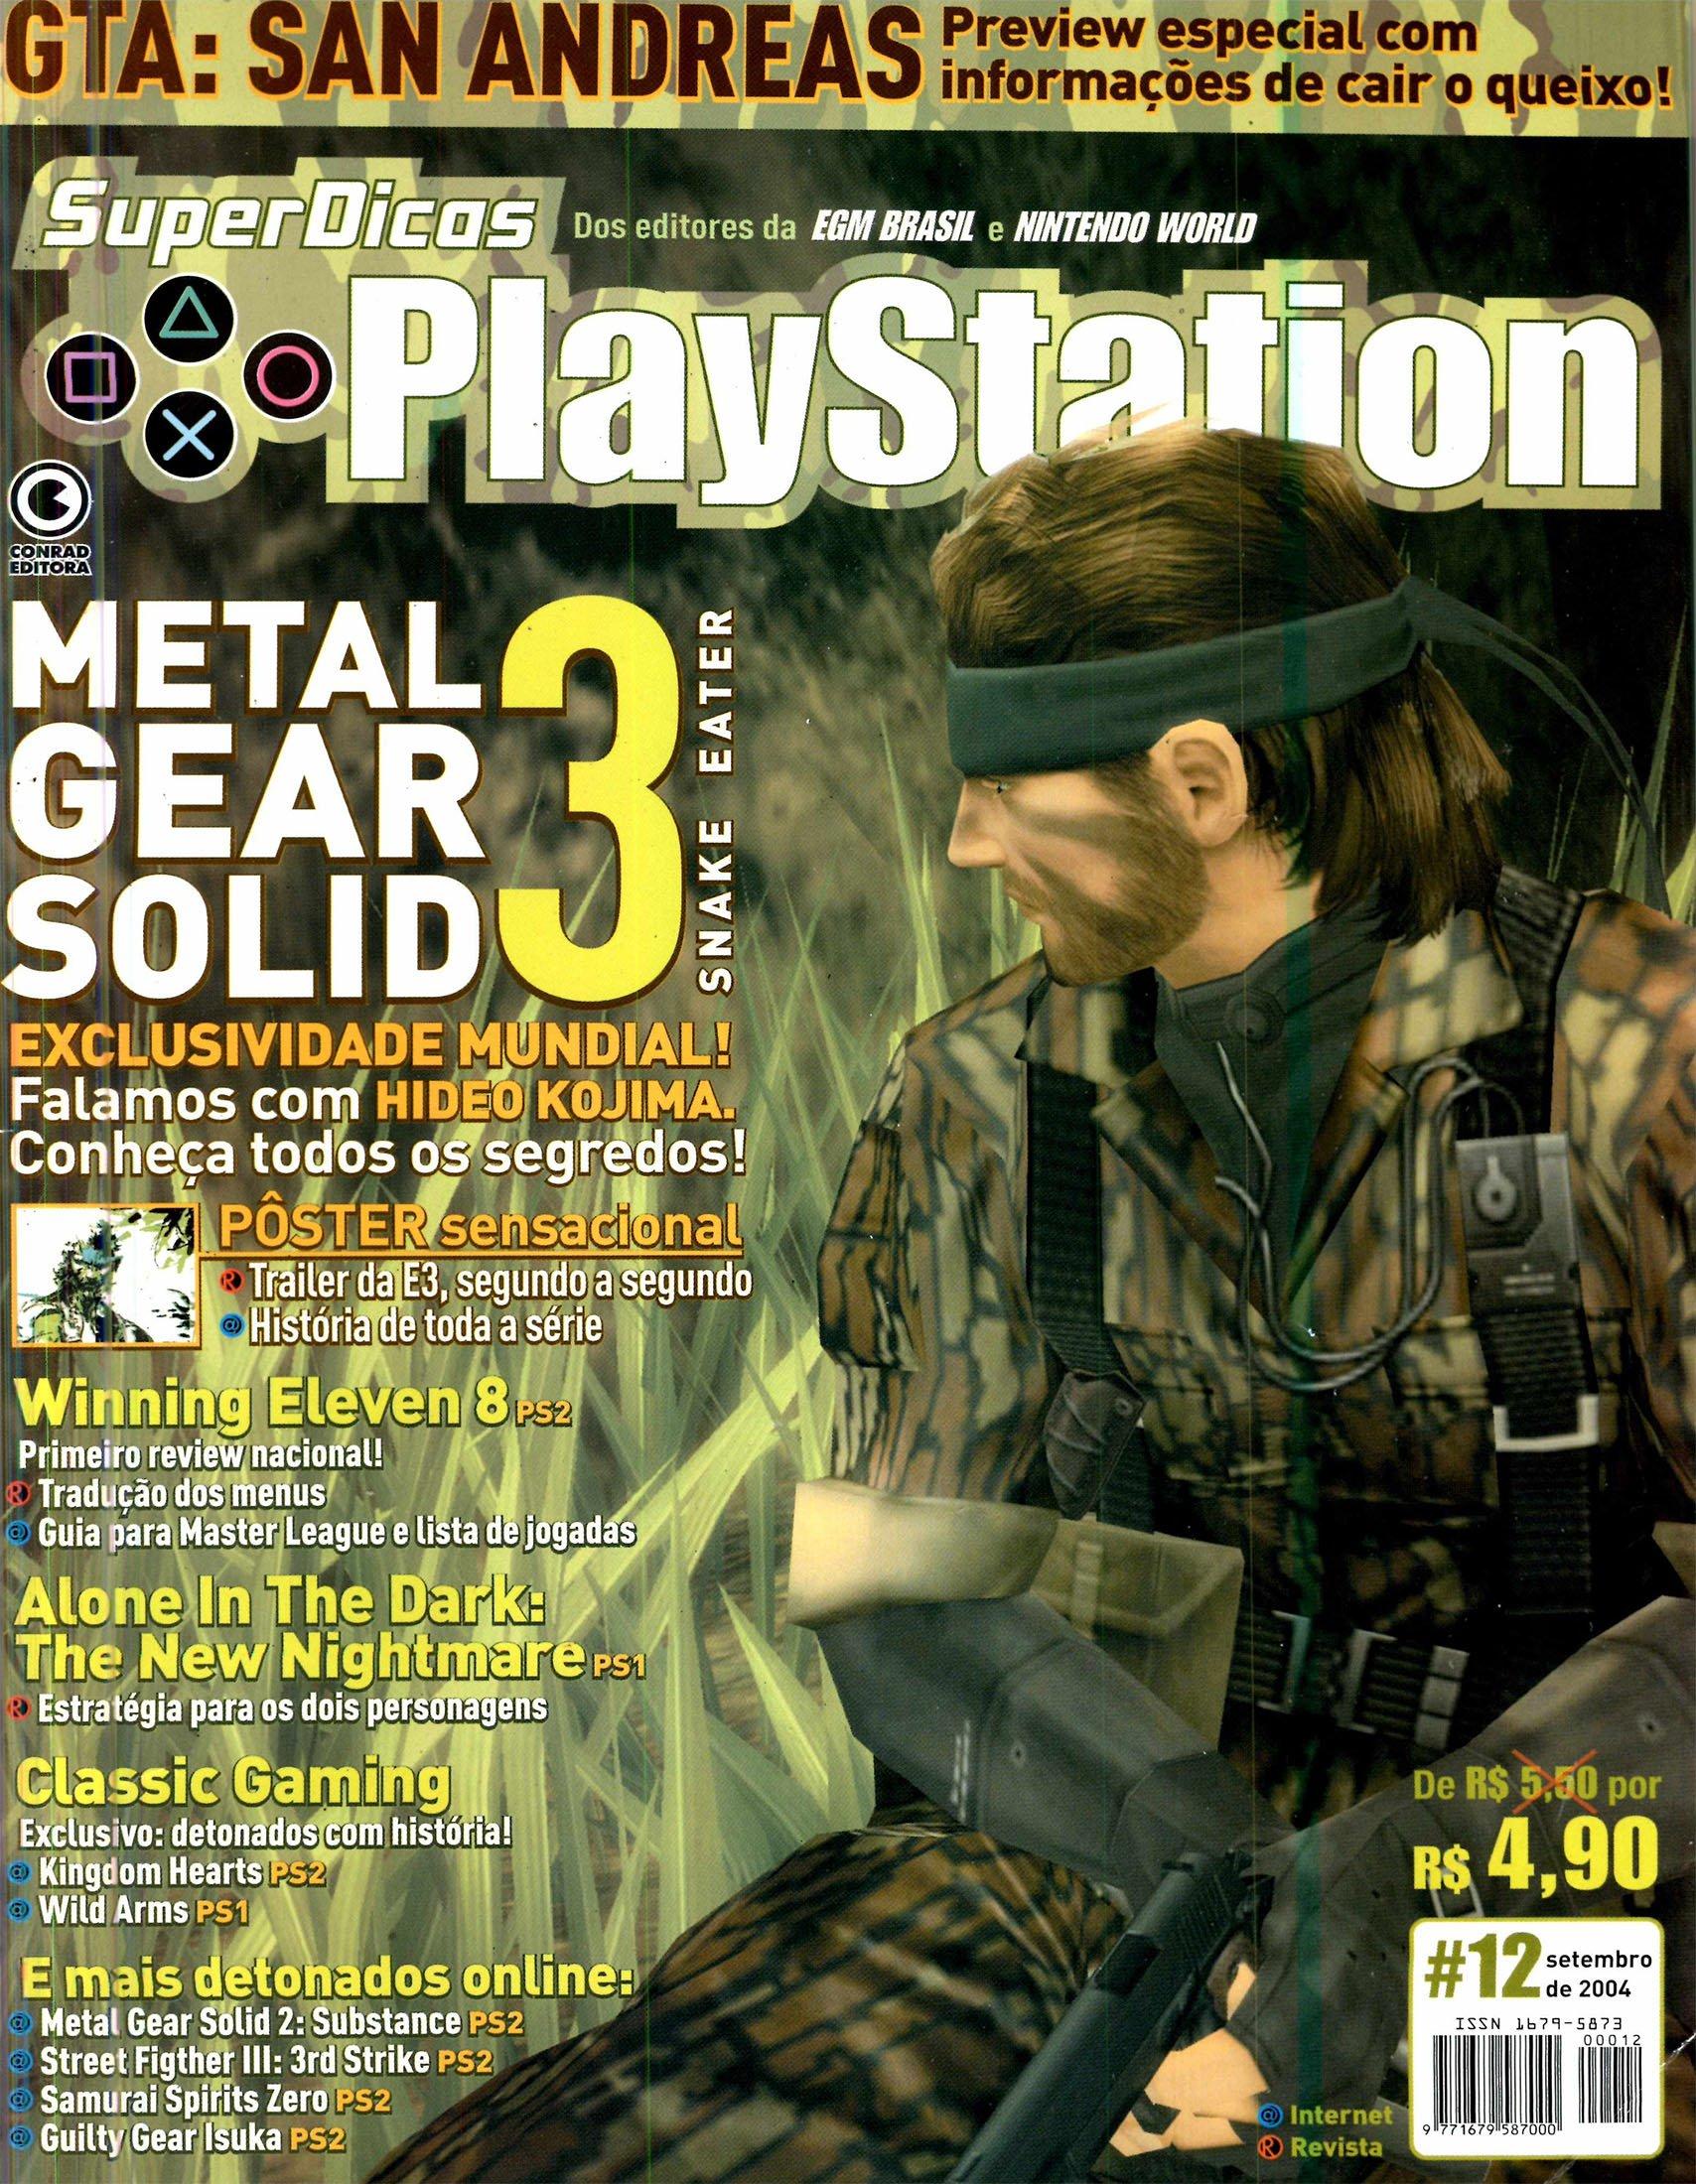 Super Dicas Playstation 12 (September 2004)